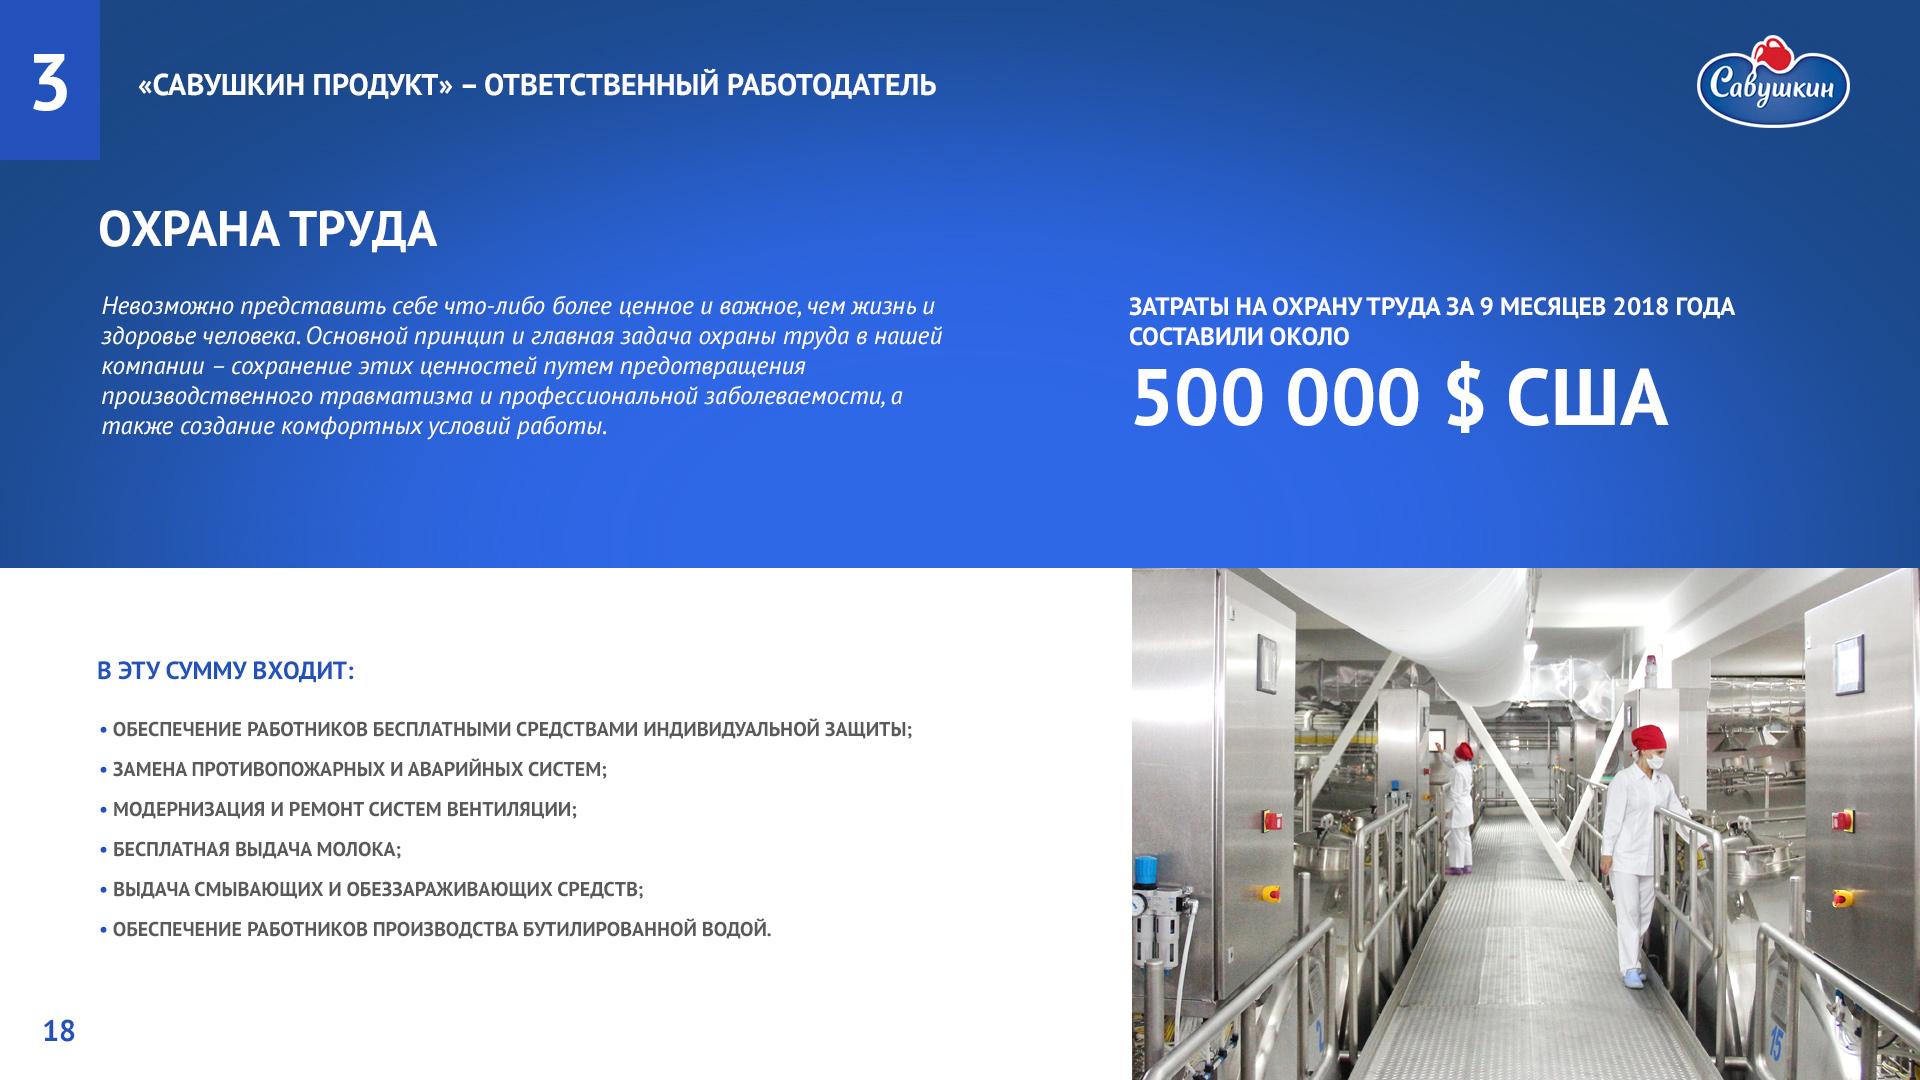 Savushkin_product_report-8